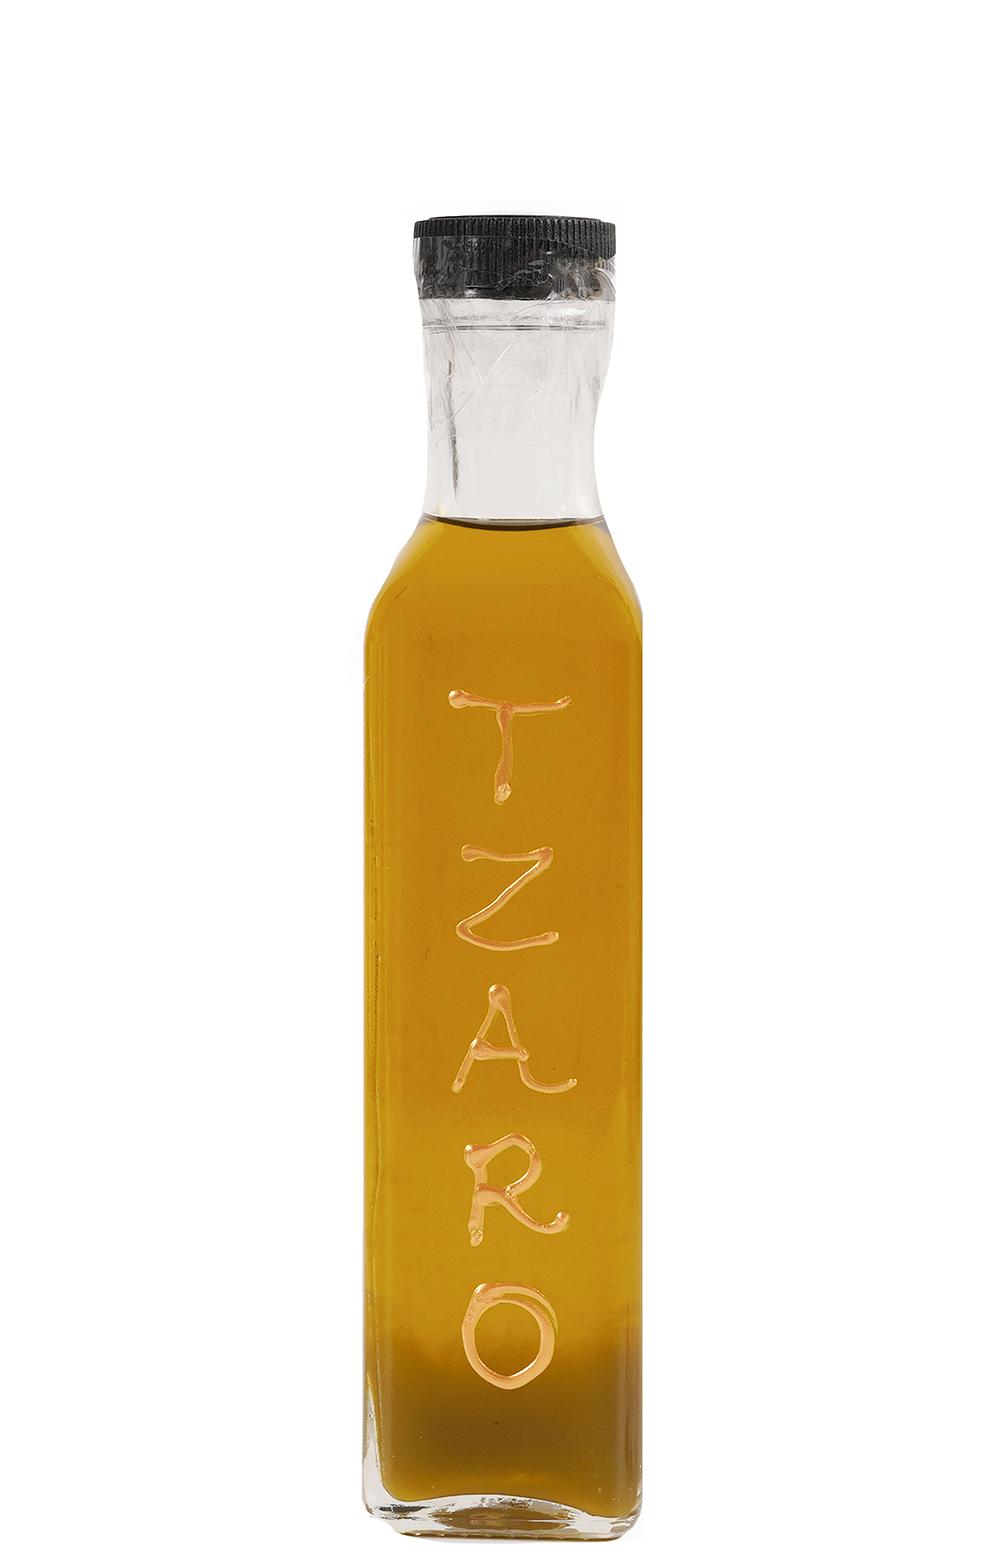 Tzaro